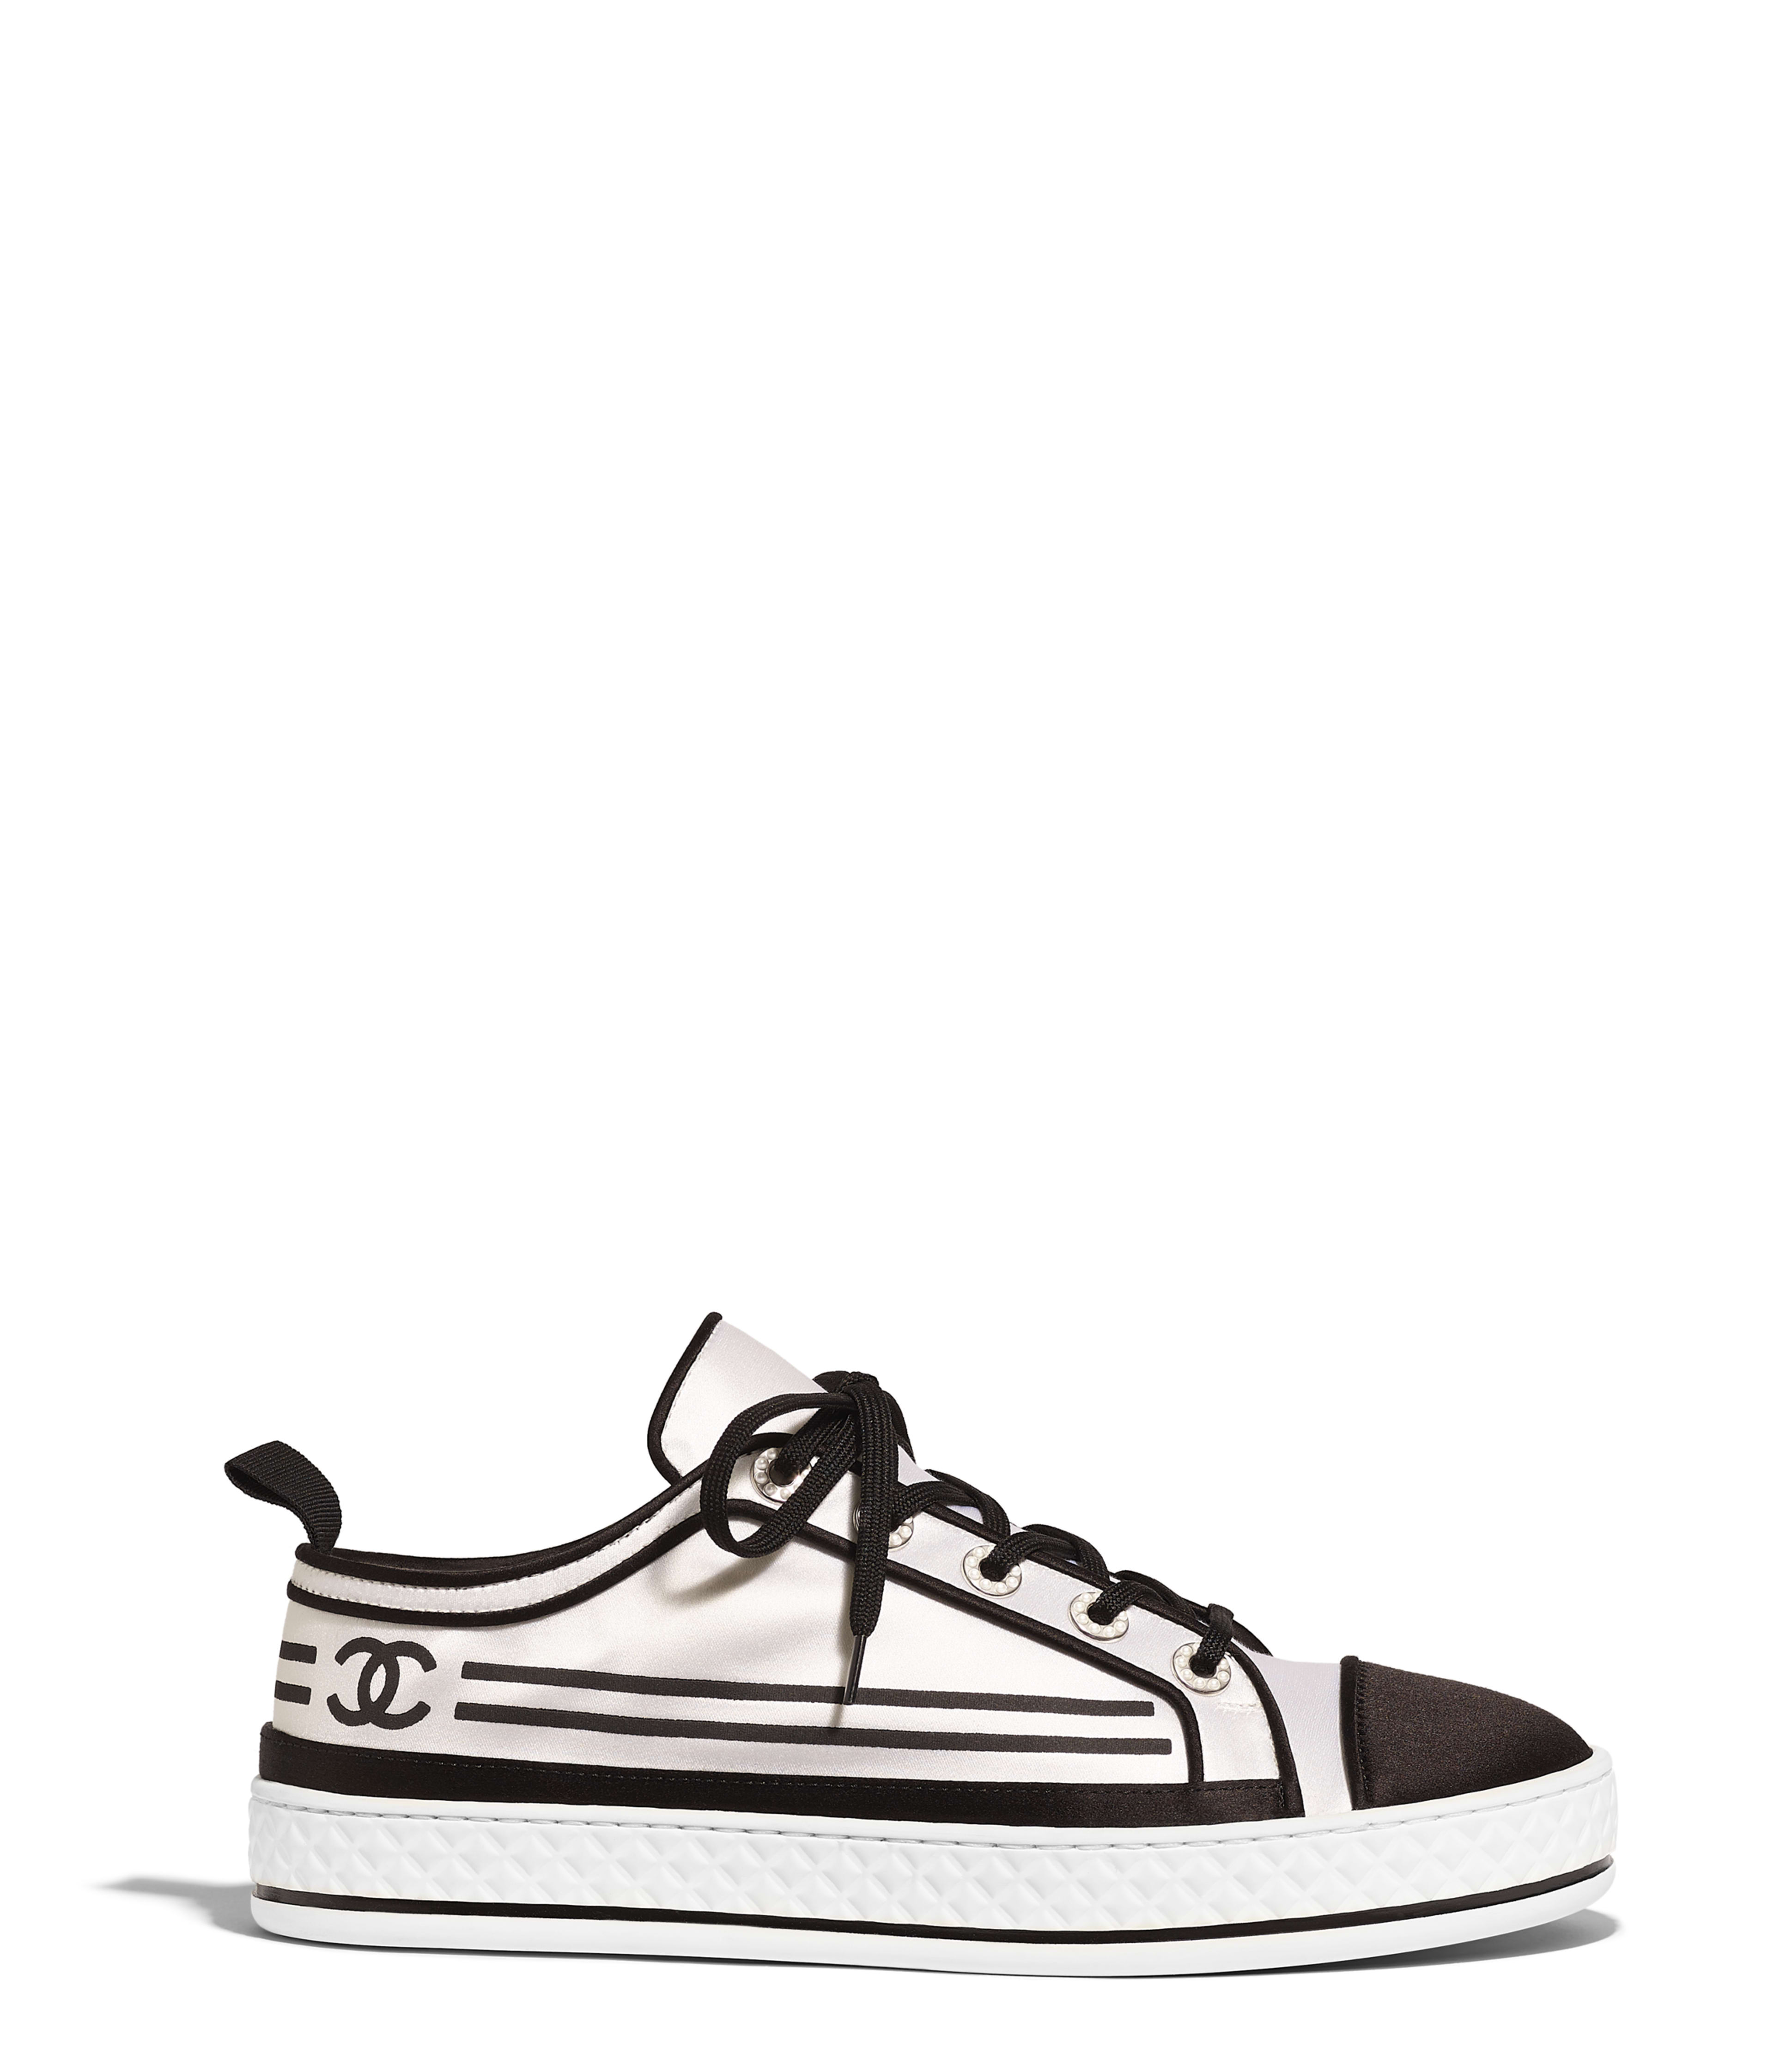 28510bdd5ae Sneakers - Shoes